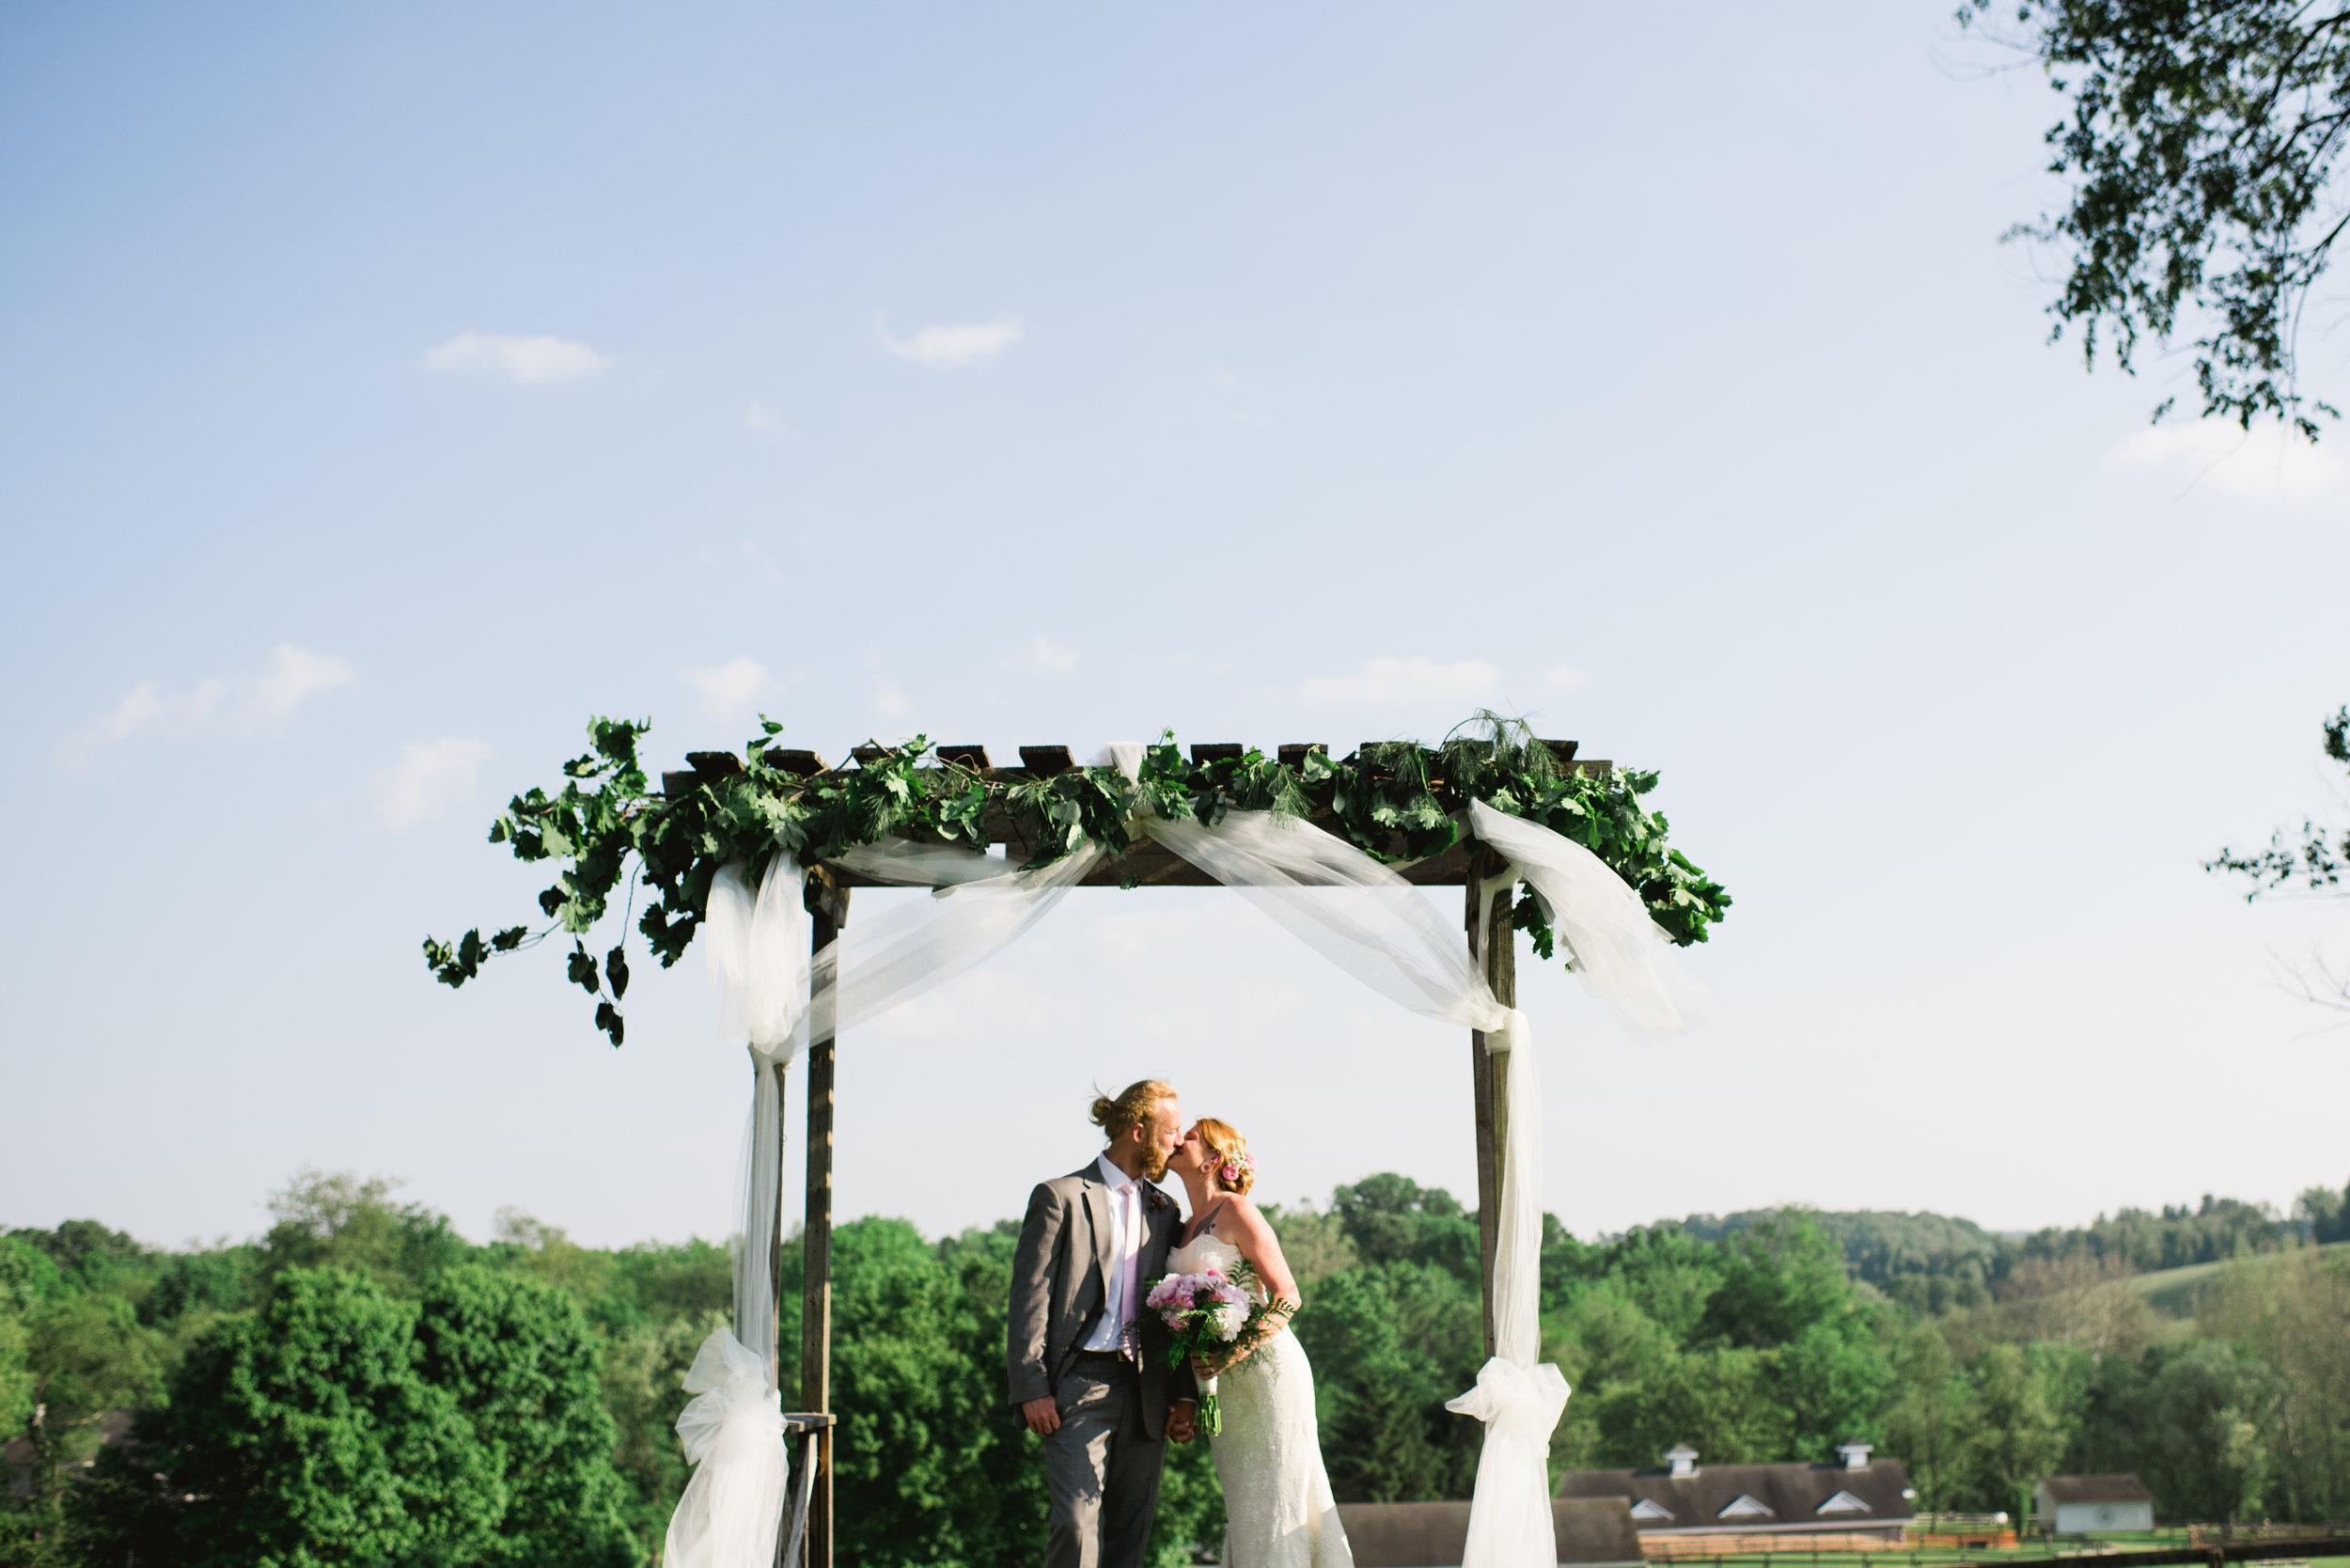 LARRIMORE-wedding-PROOFS-5989.jpg